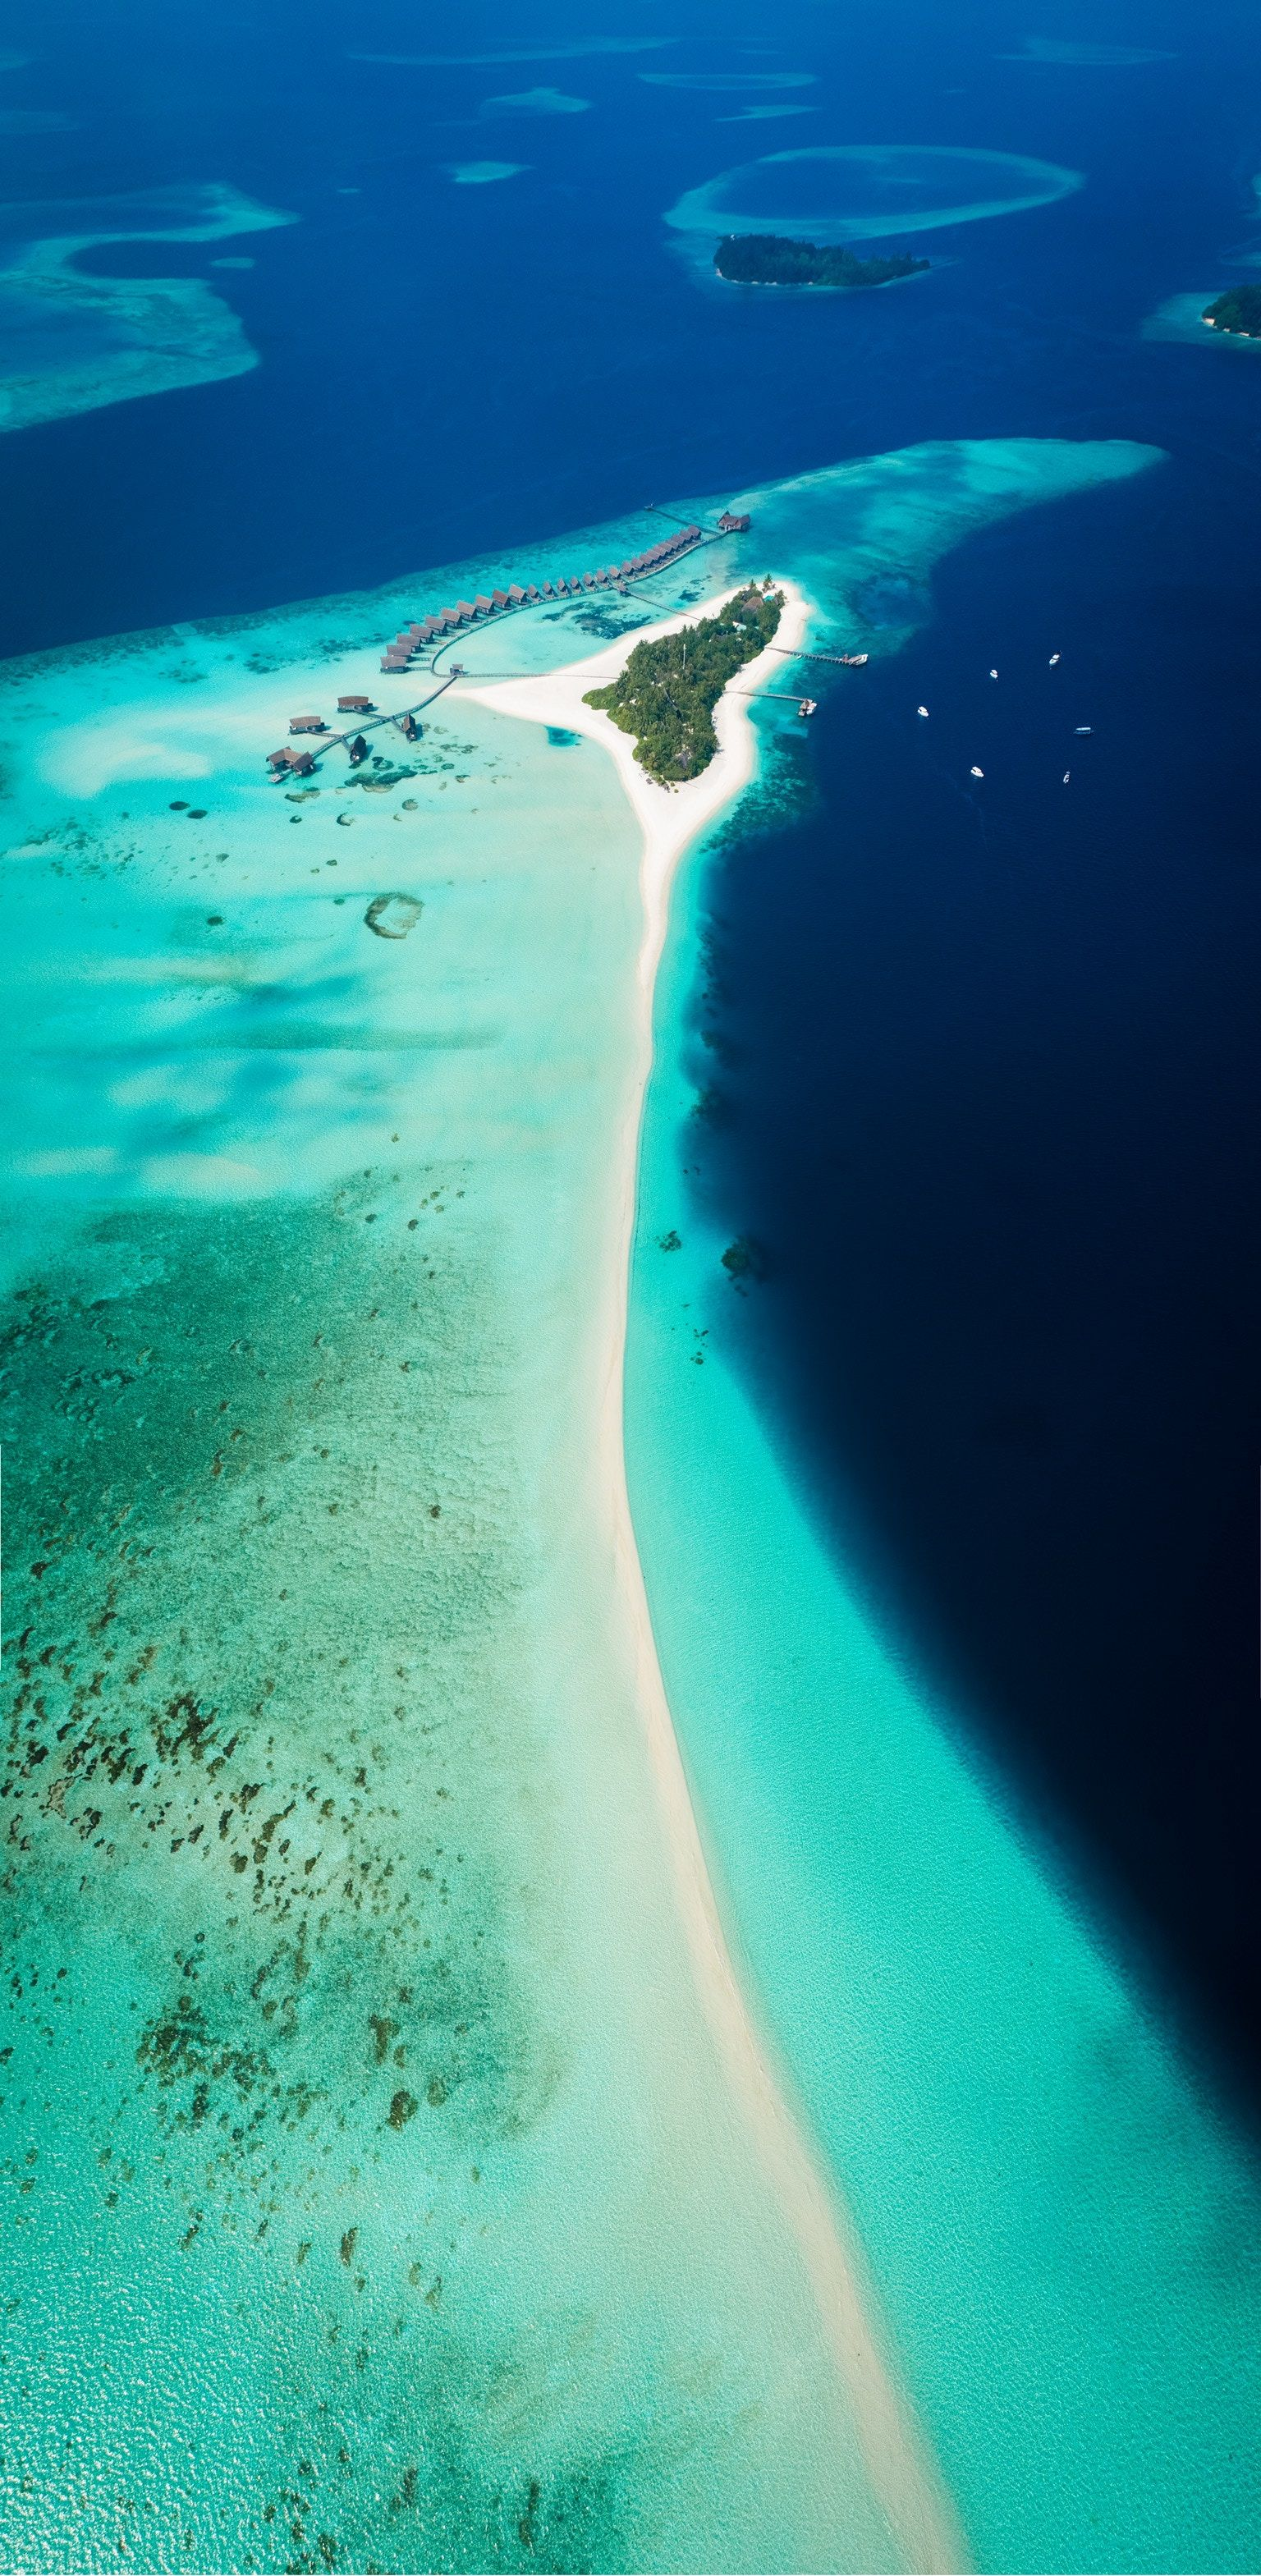 30 Best Paradise Islands You Should Visit In 2020 Tourscanner Malediven Urlaub Malediven Malediven Reisen